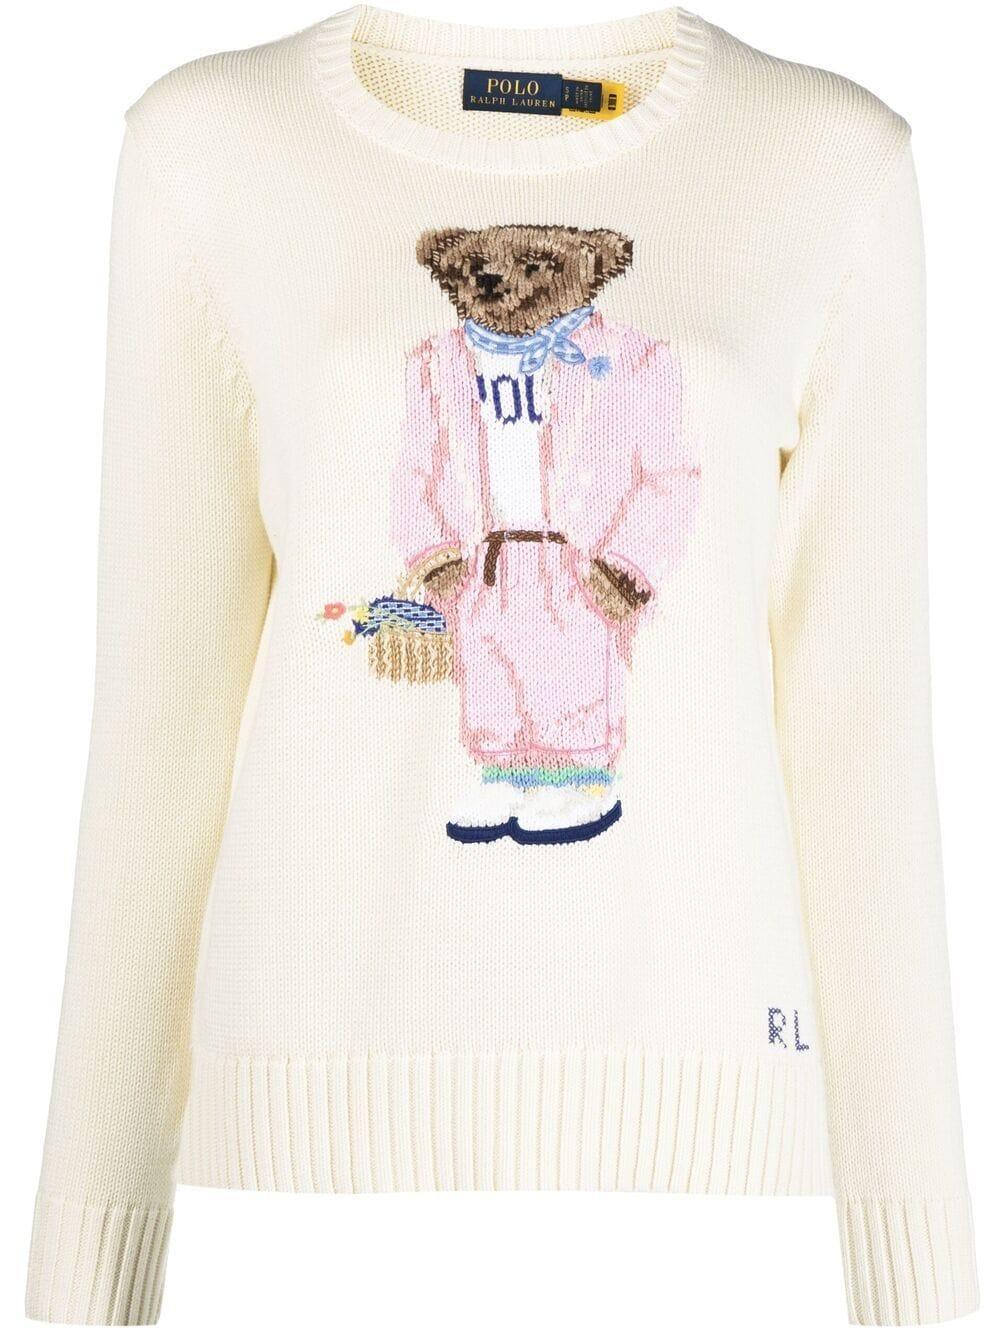 Polo Picnic Bear Sweater Item # 211838006001